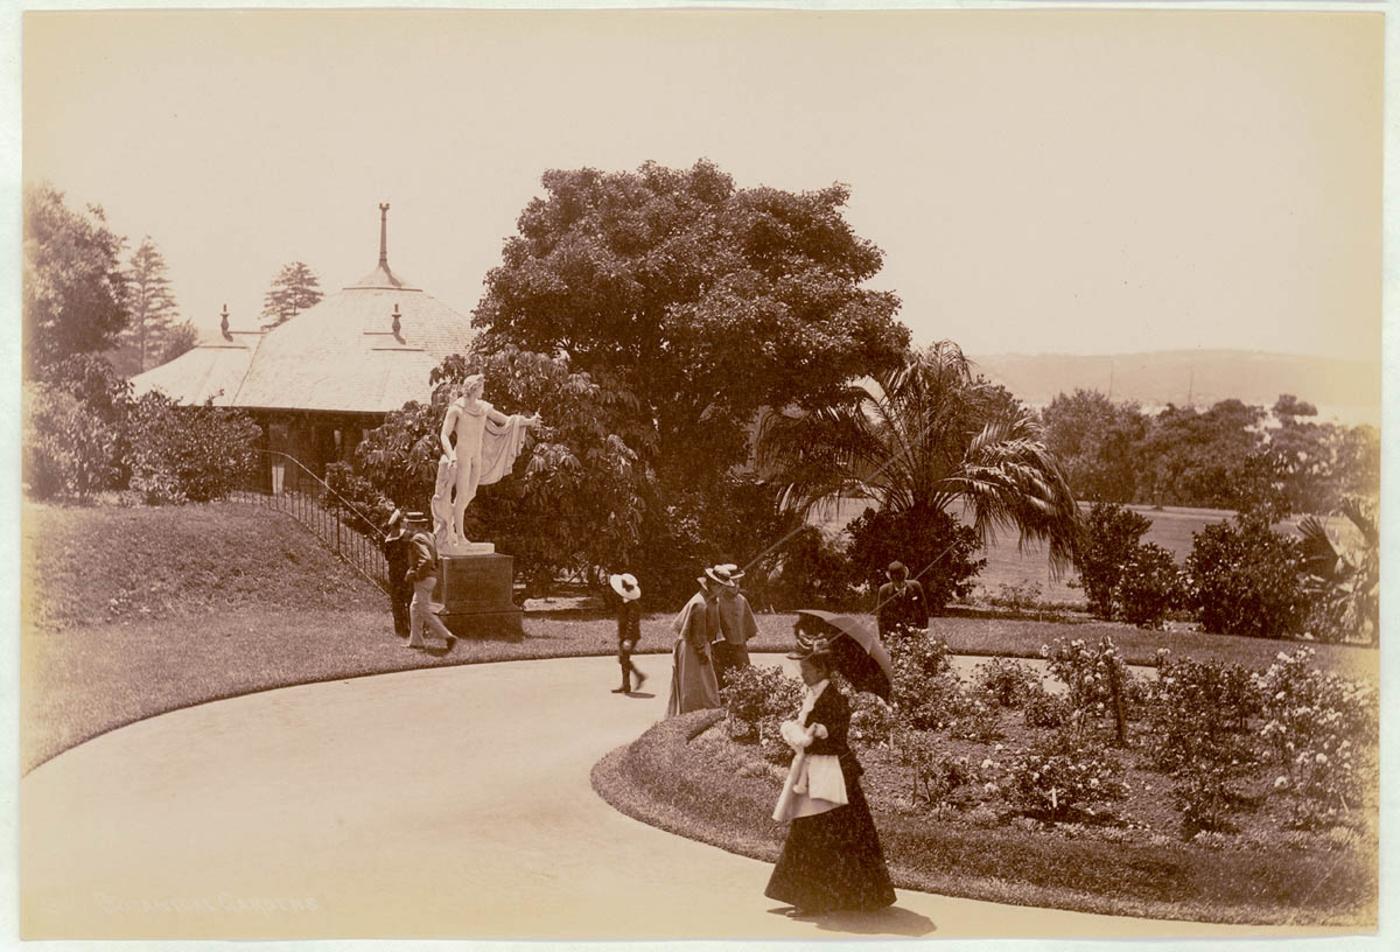 Botanical Gardens, Sydney [showing statue of Apollo Belvedere], c. 1900-1910